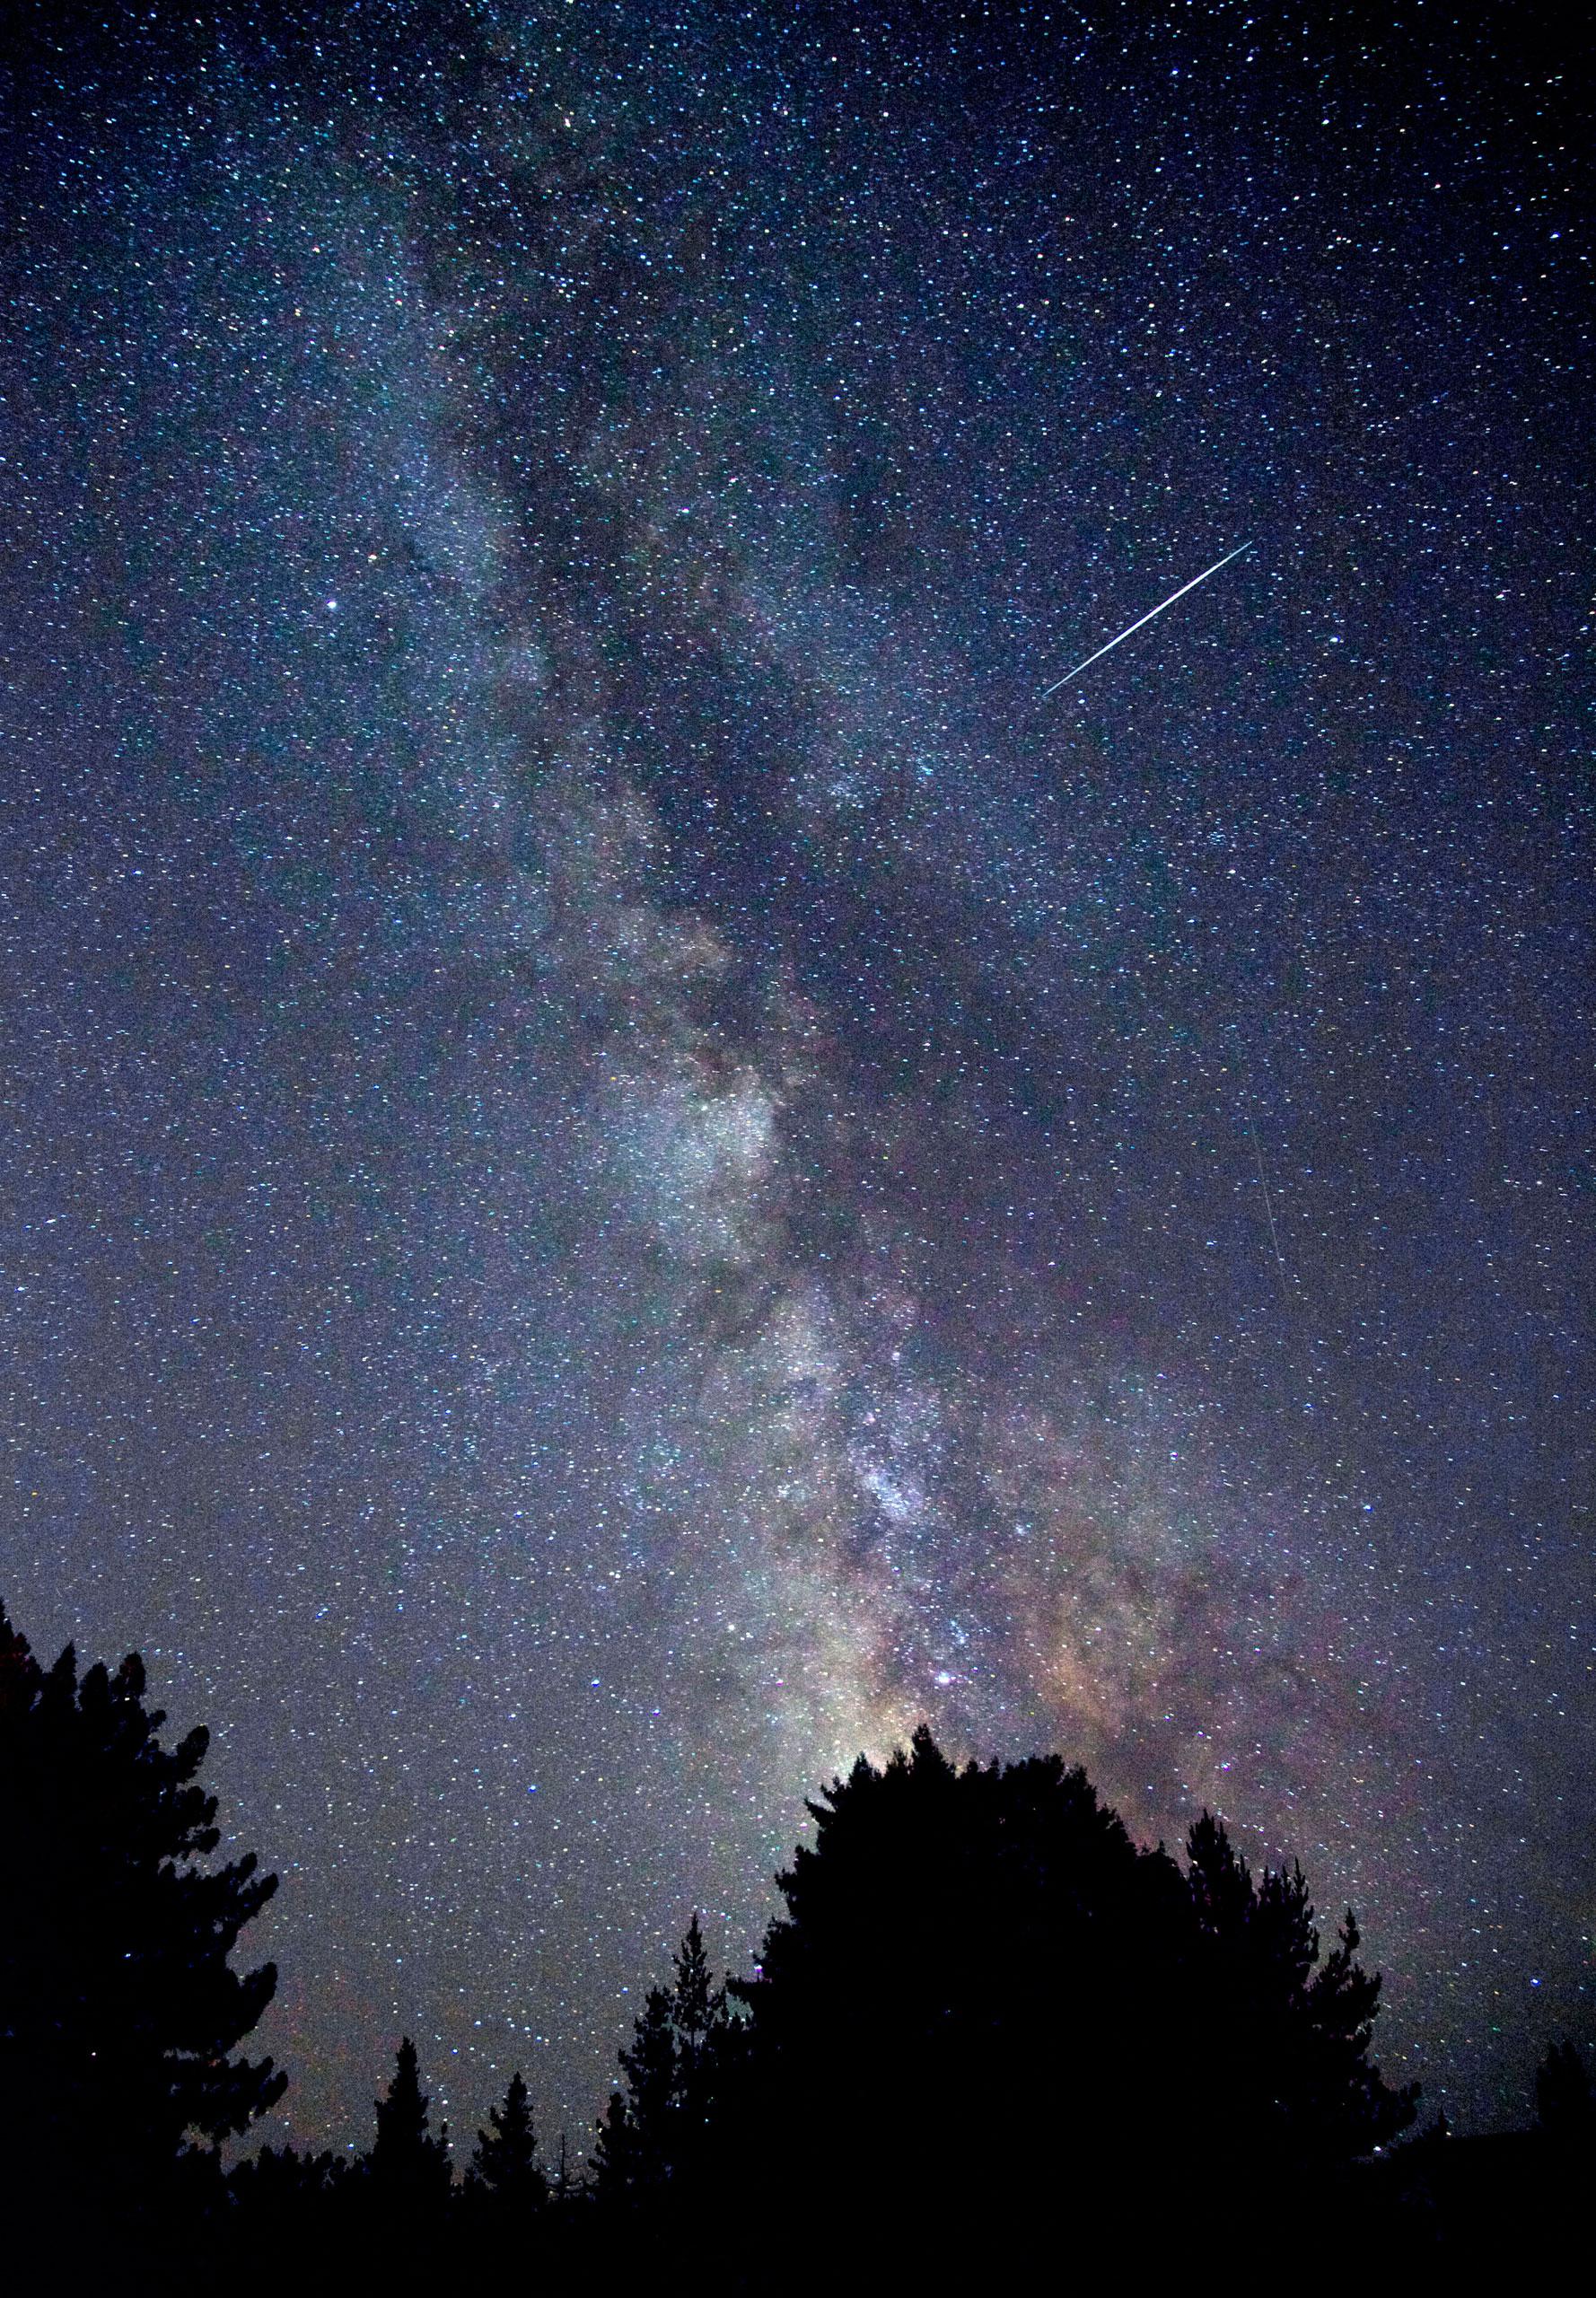 A Perseid meteor shower set against the Milky Way in Sebastopol, Calif., on Aug. 12, 2010.